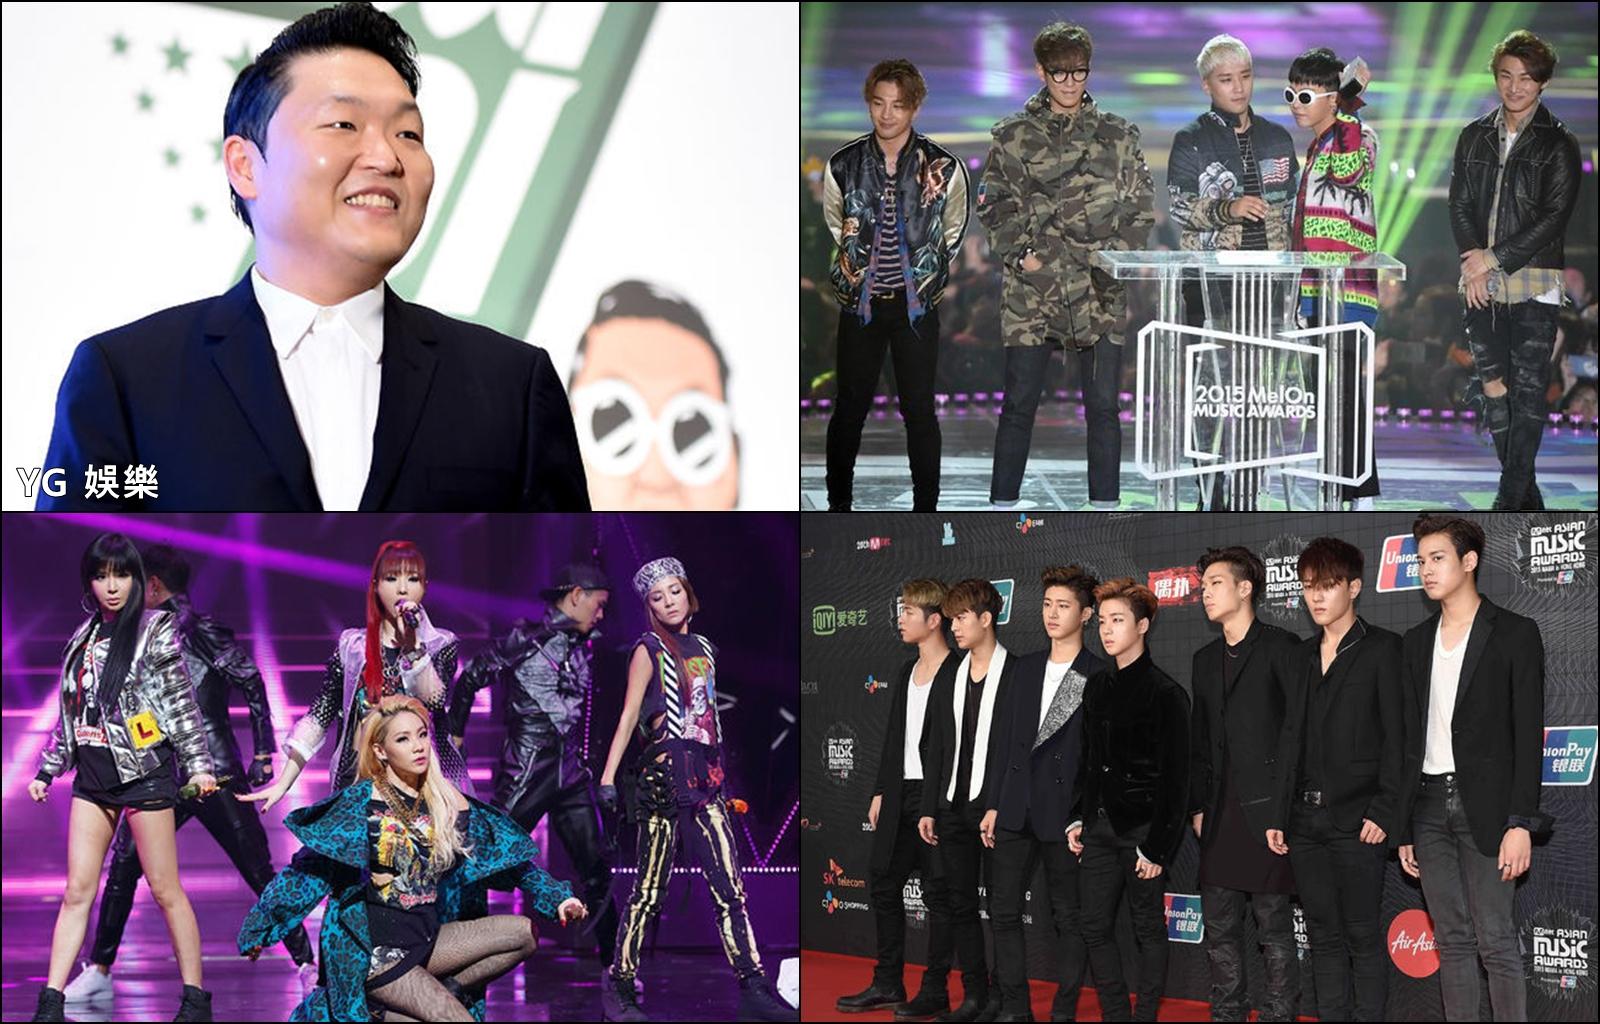 ★YG 娛樂 ★  「就算沒有活動,也可以在 MAMA 上看到表演舞台。」